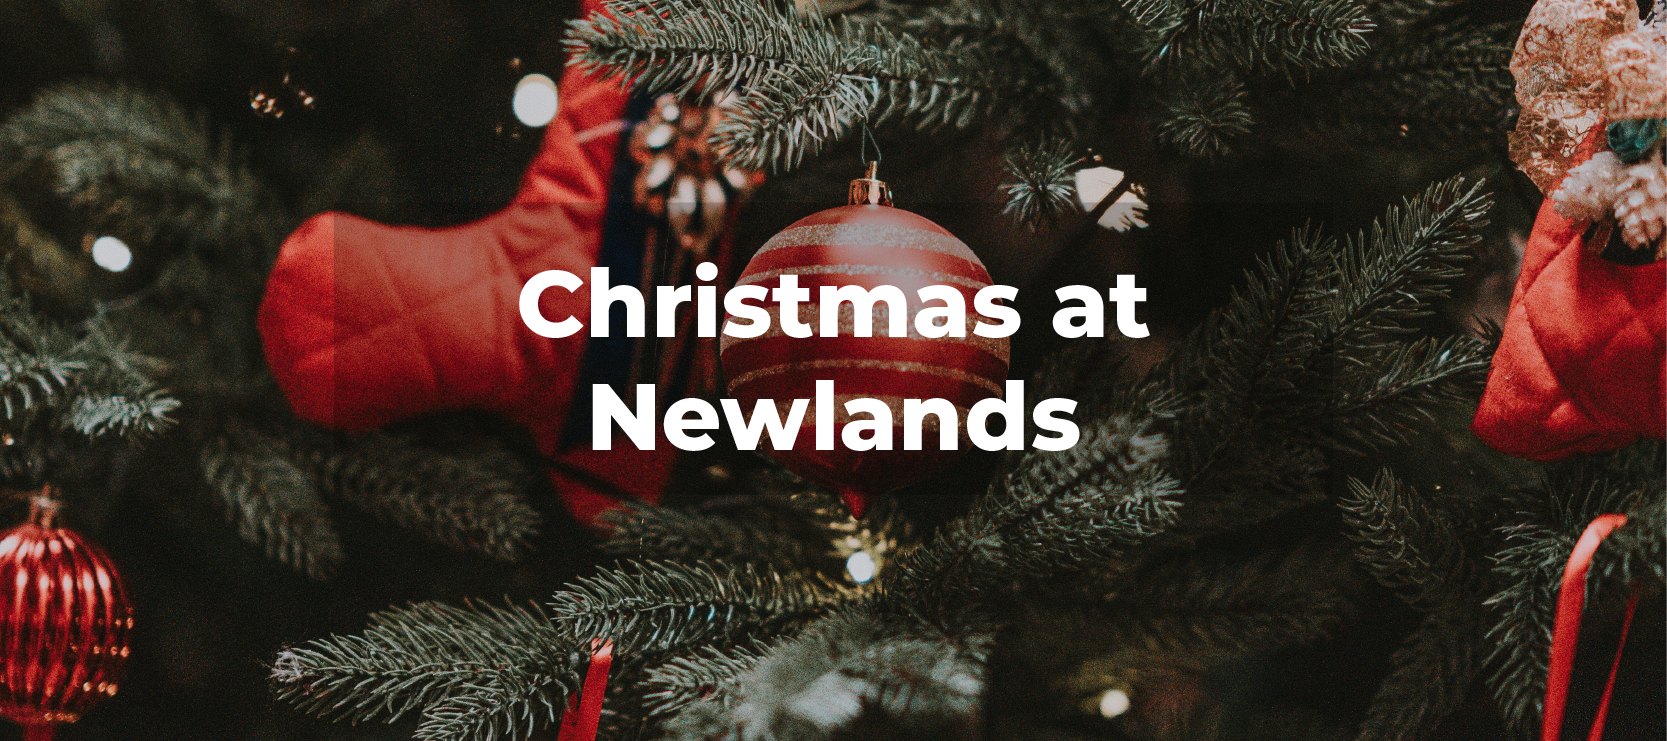 Christmas at Newlands